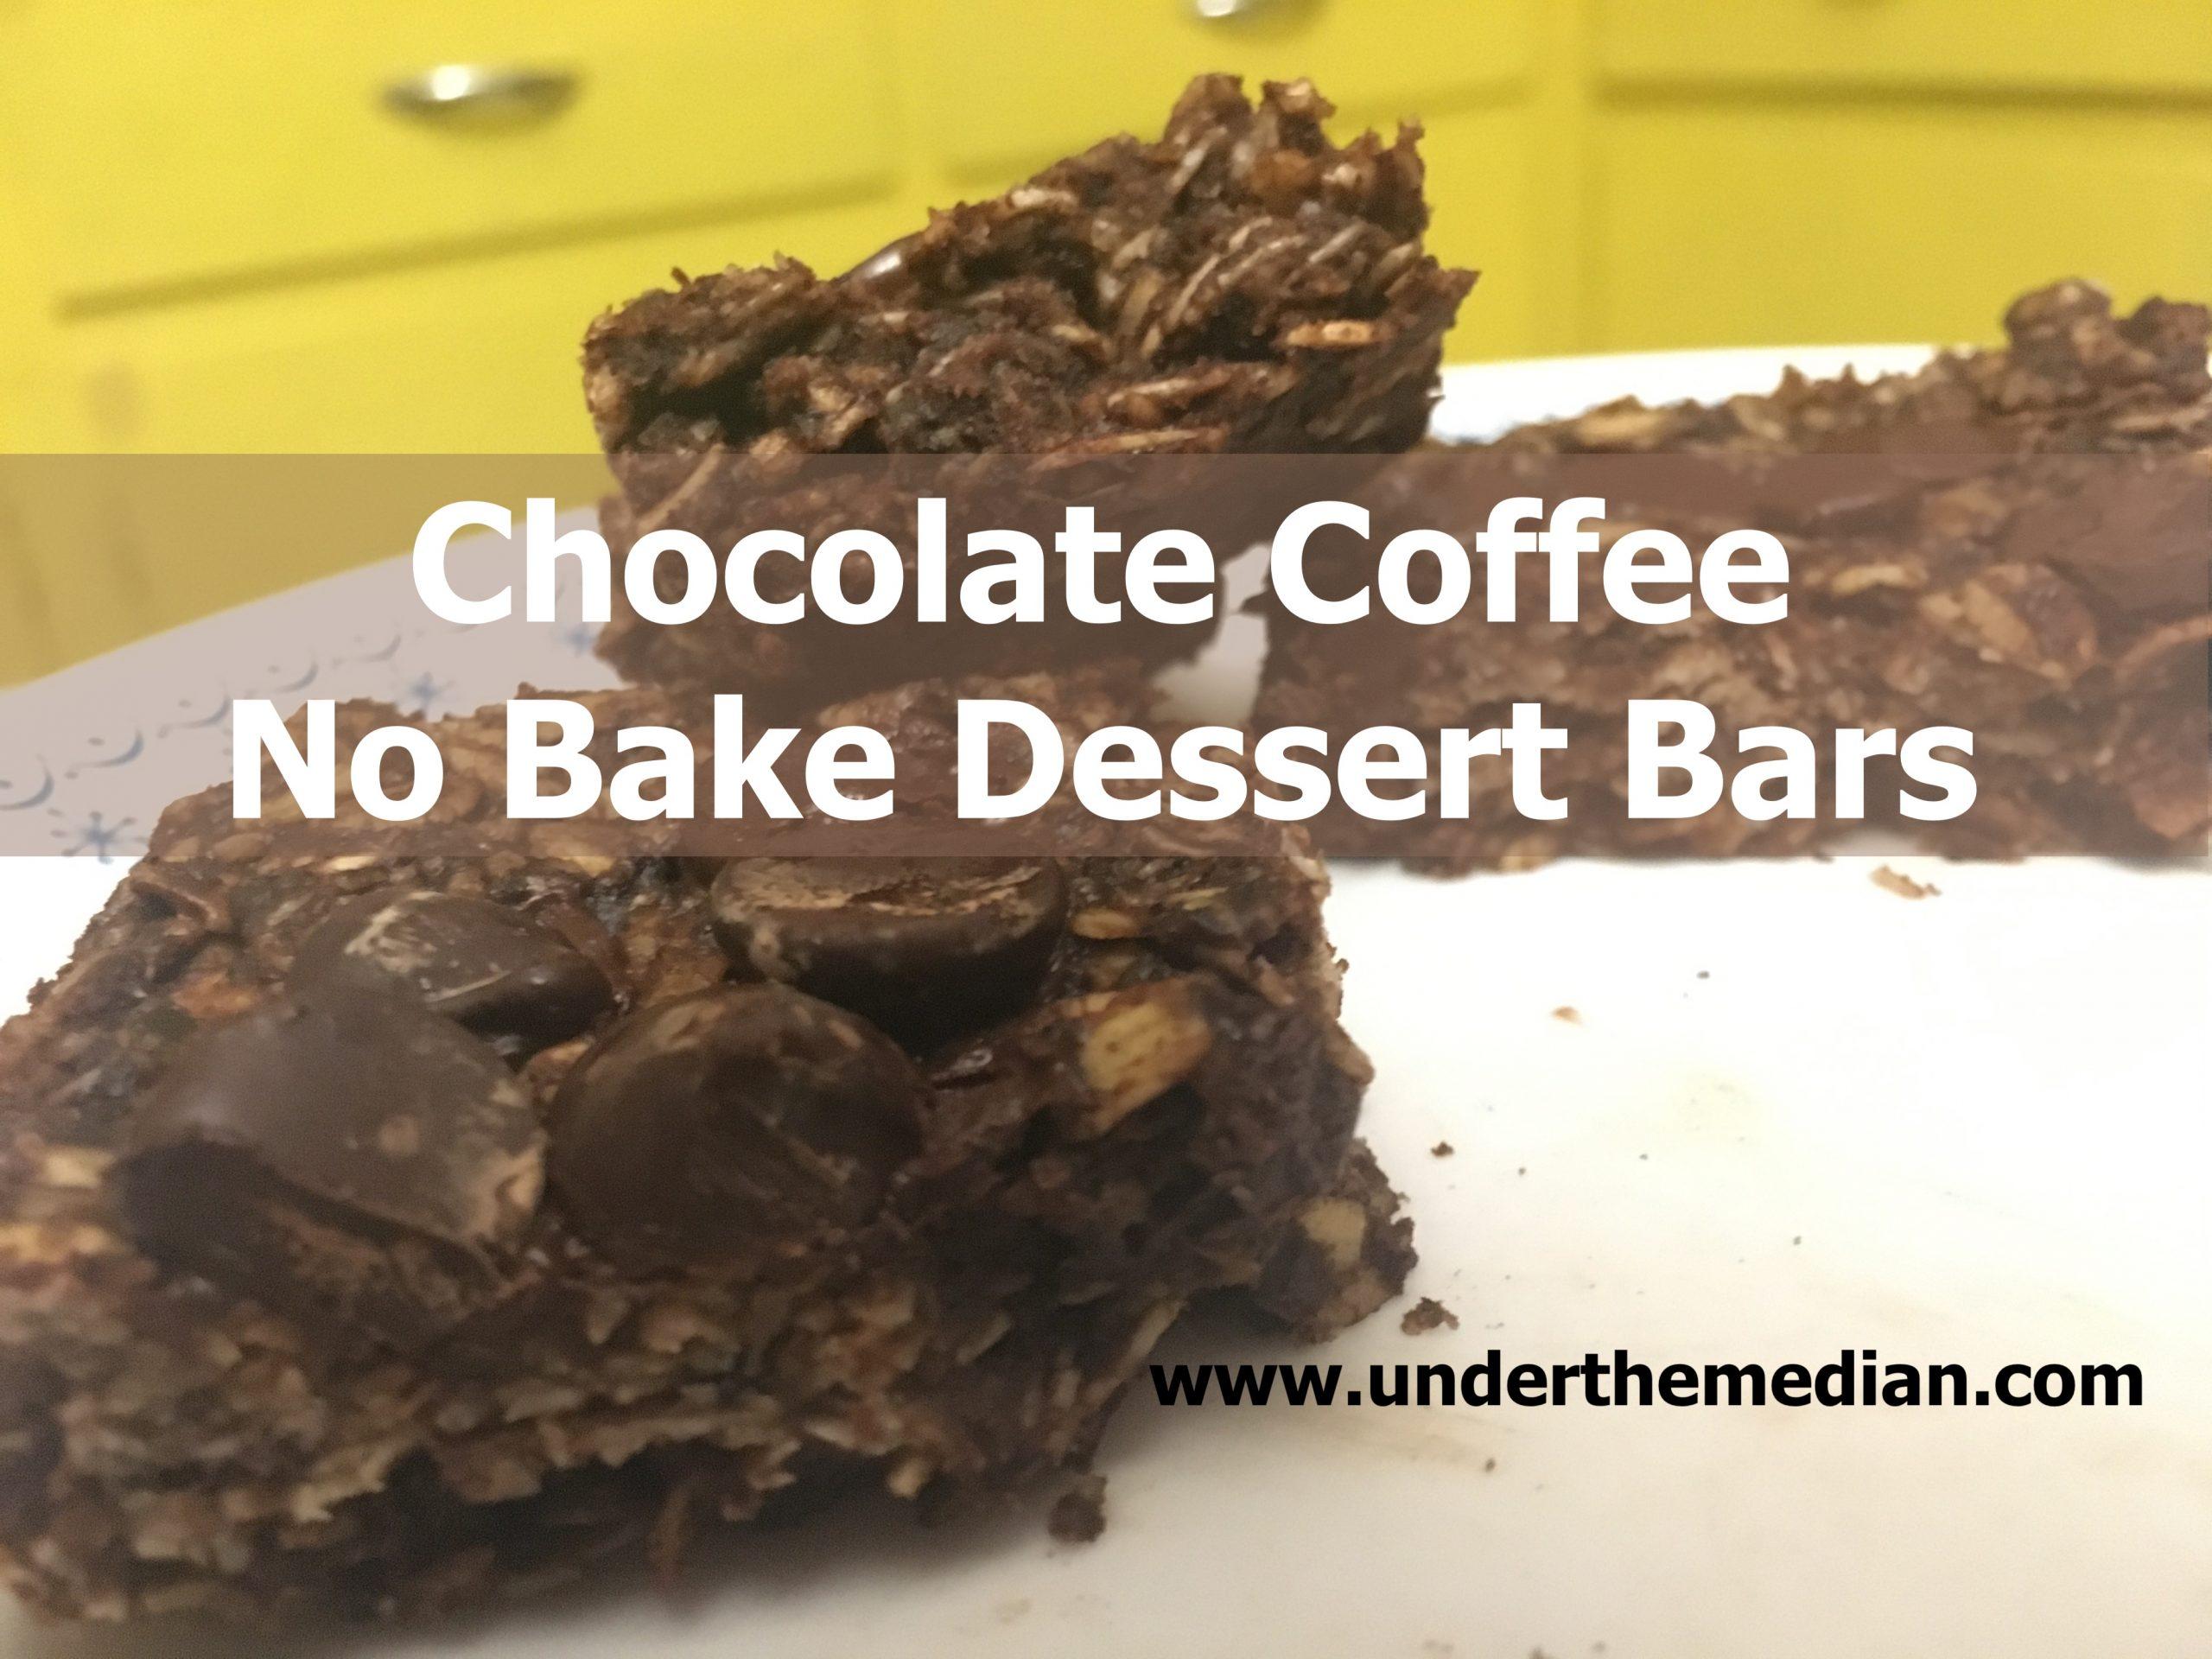 Chocolate Coffee No-Bake Dessert Bars (Vegan)